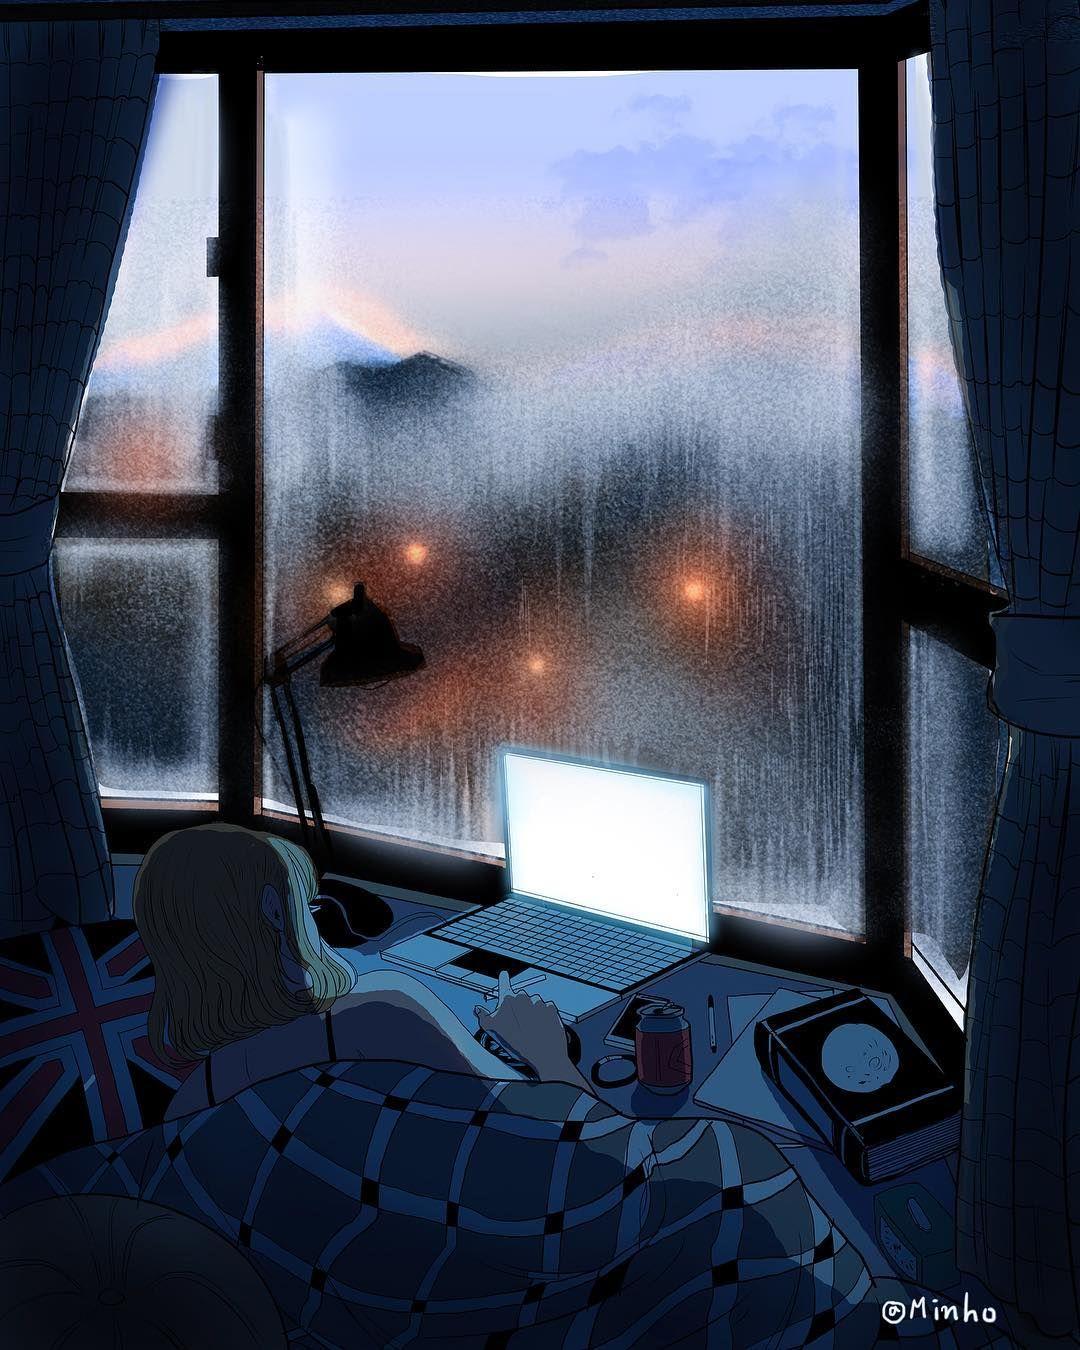 Cozy Homedecoration: It's Already Morning... By Myeong-Minho. Http://bit.ly